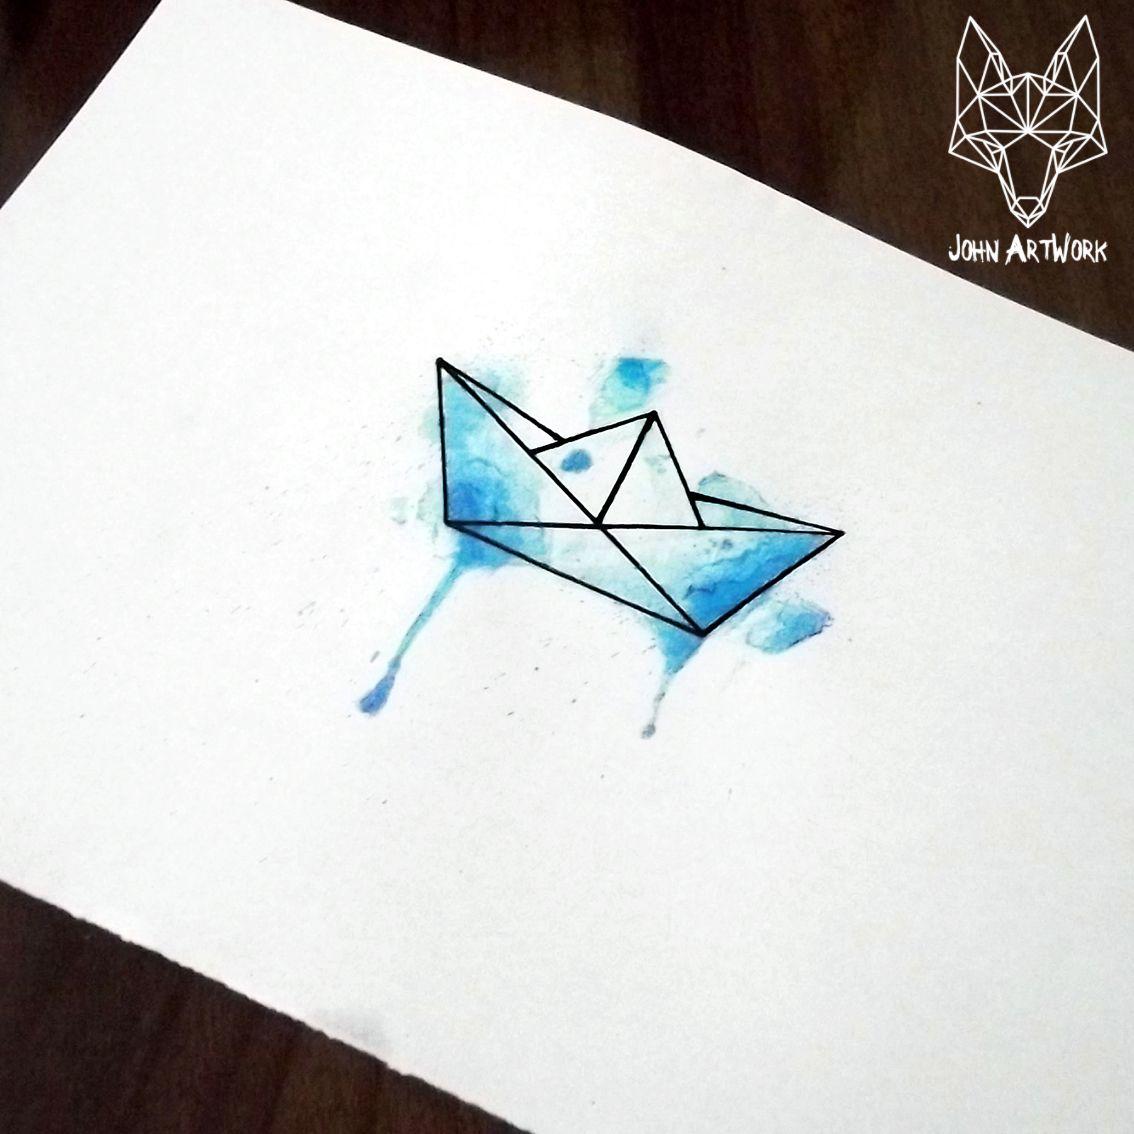 Rowing Tattoos Designs